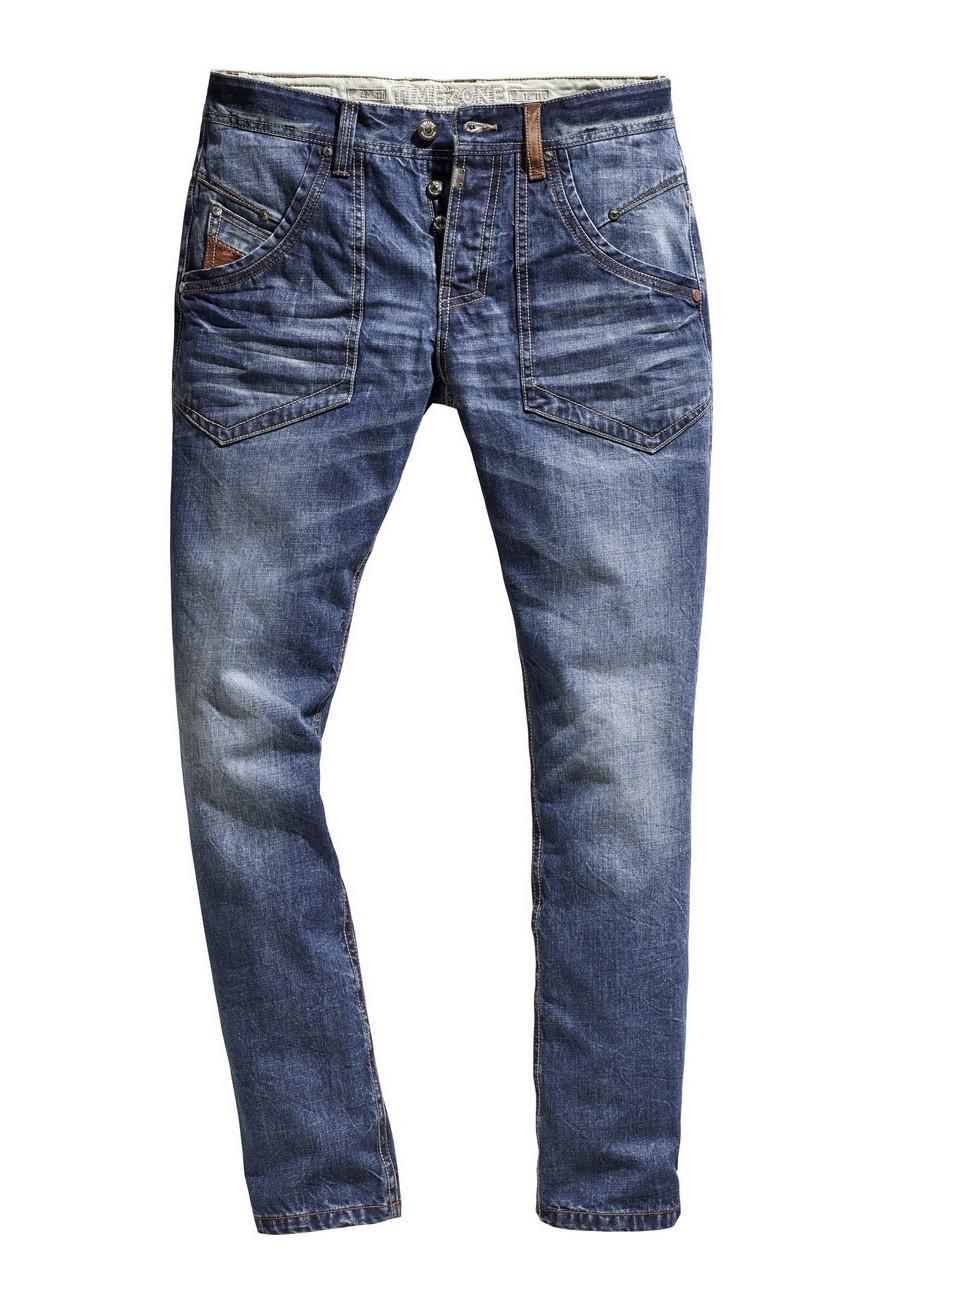 timezone herren jeans claymoretz comfort fit blau. Black Bedroom Furniture Sets. Home Design Ideas